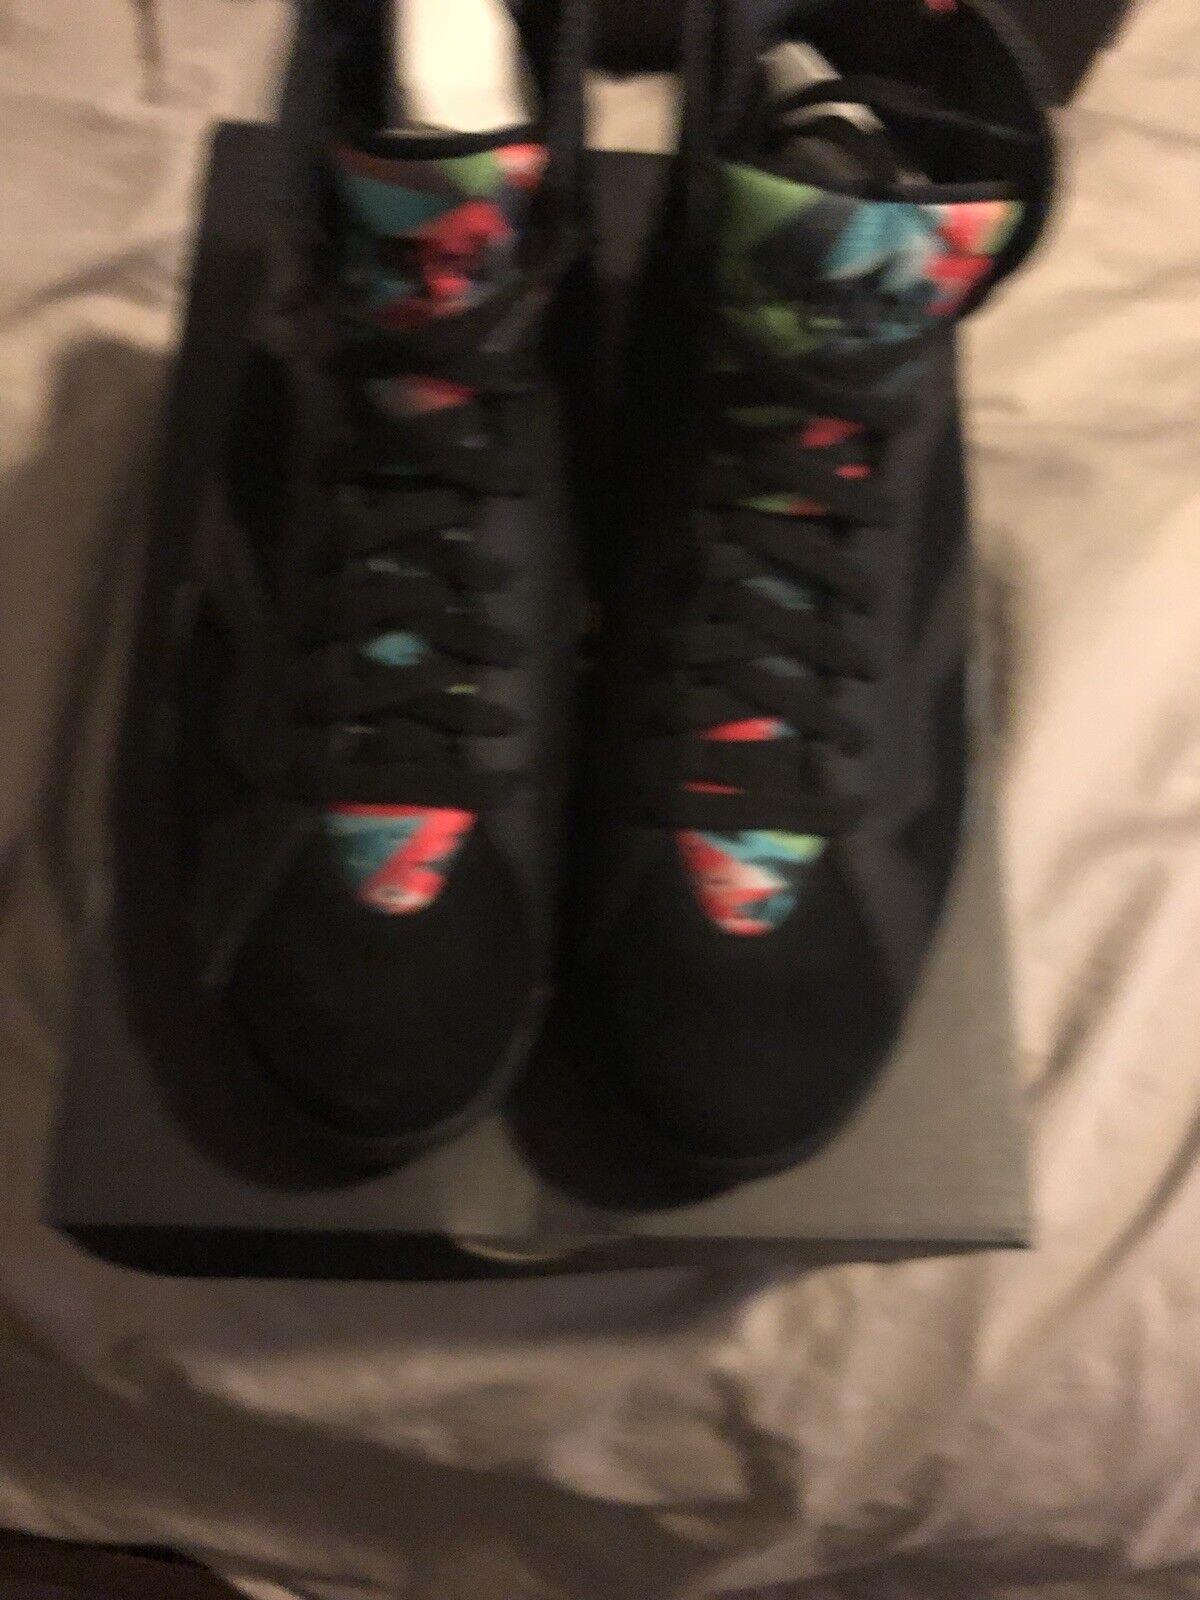 Nike Air Jordan 7 Vll Retro 'Barcelona Nights/Marvin the Martian' Uomo Size 10